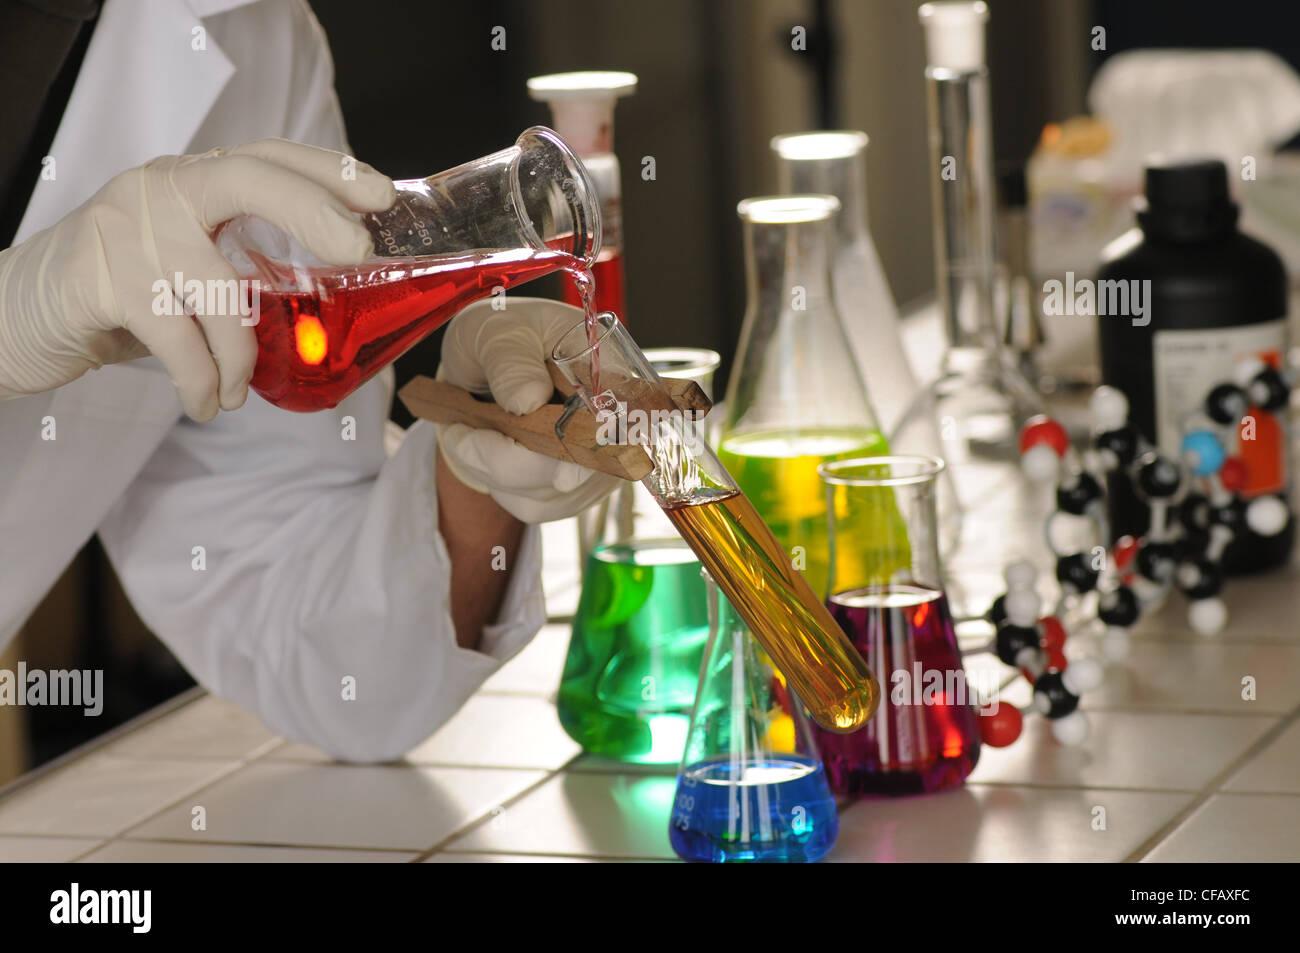 Mann, Forschung, Lehrer, Chemie, Labor, Formeln, Experiment, Wissenschaft, Schule, Bildung, Chemikalien Stockbild